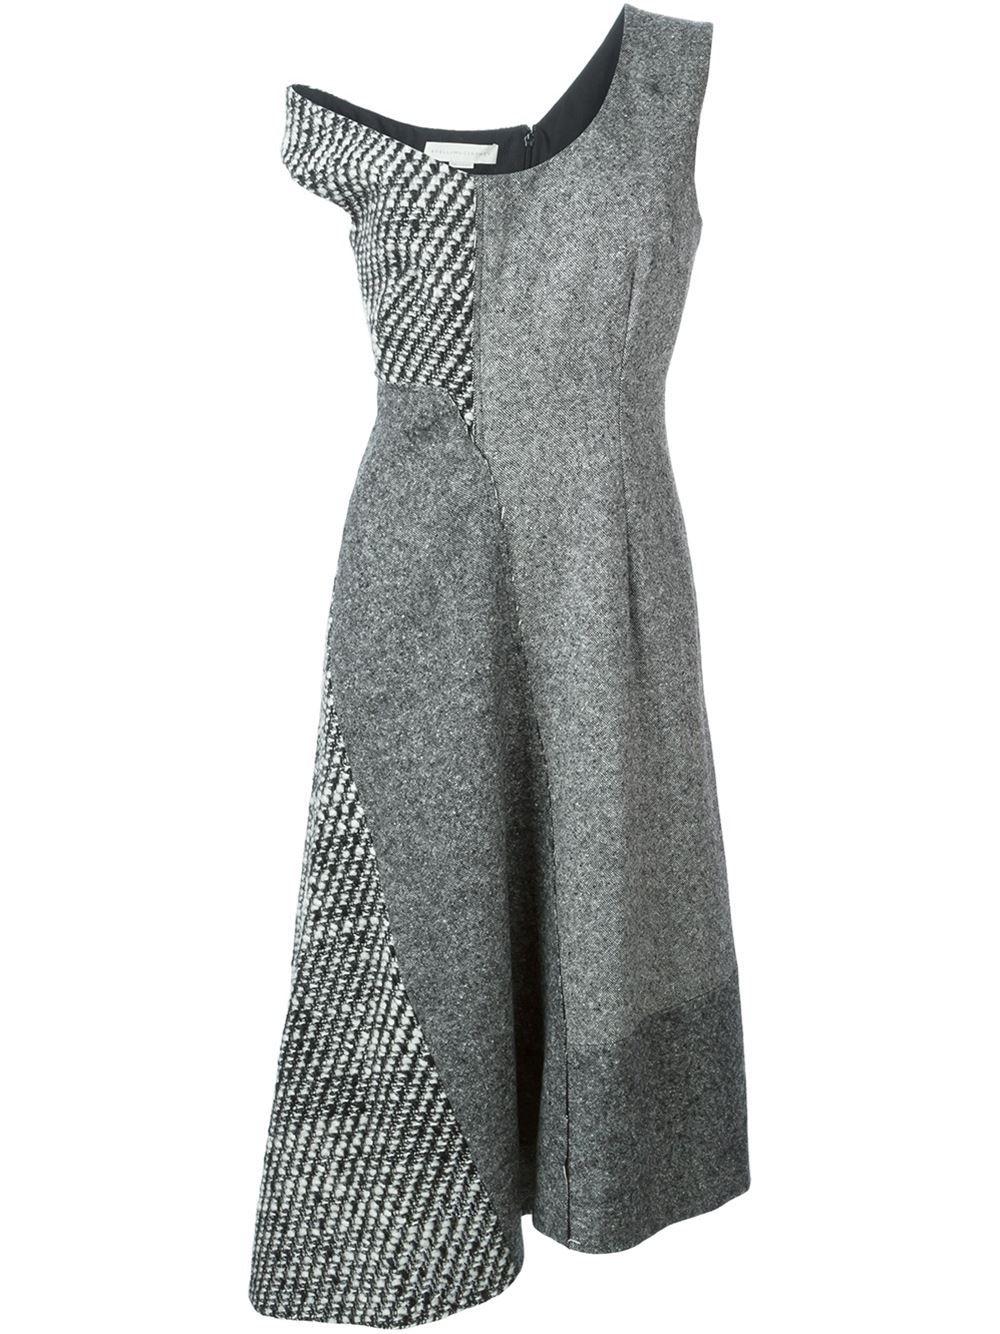 e7be098853d87 Stella Mccartney 'jackie' Tweed Dress - Banner - Farfetch.com ...